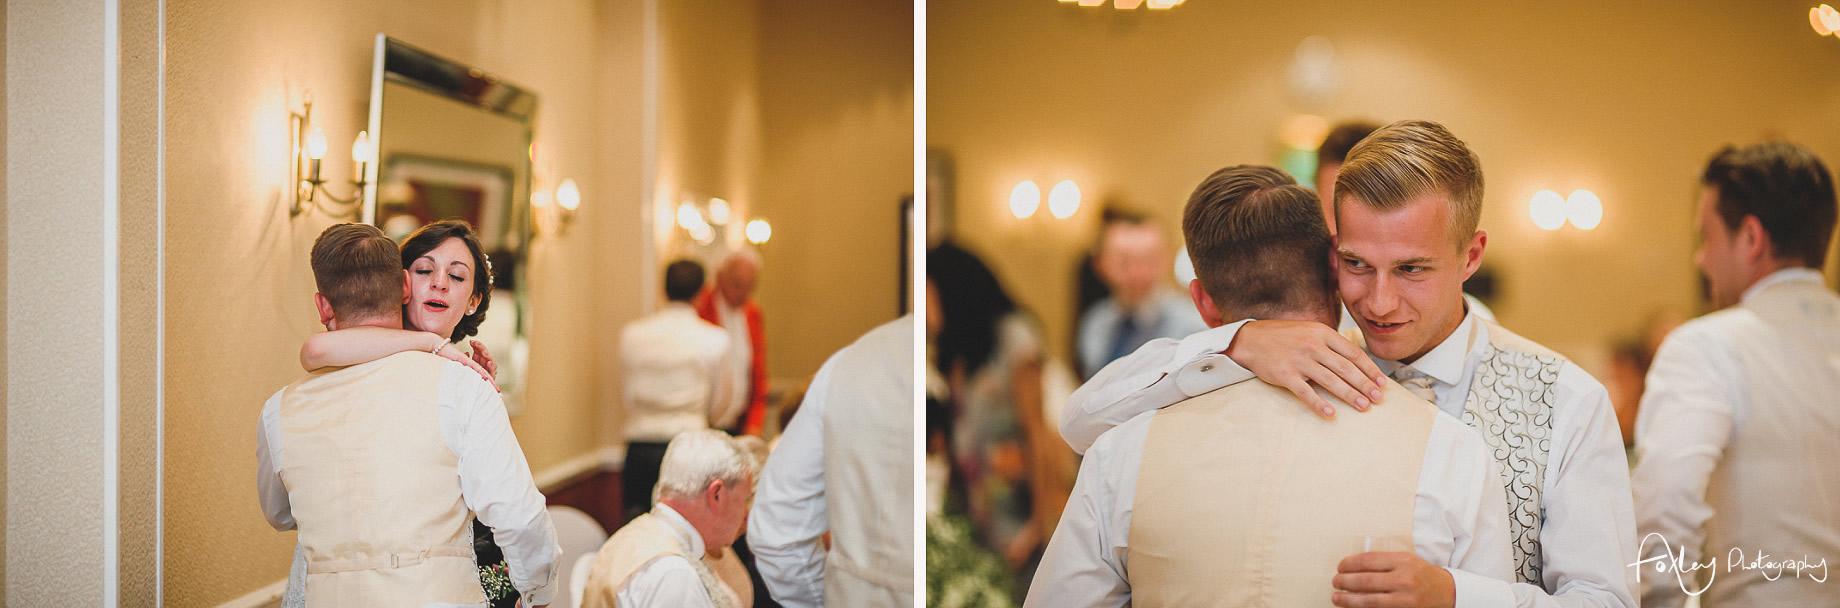 Rebecca and Dan Wedding at Preston Marriott Hotel 131